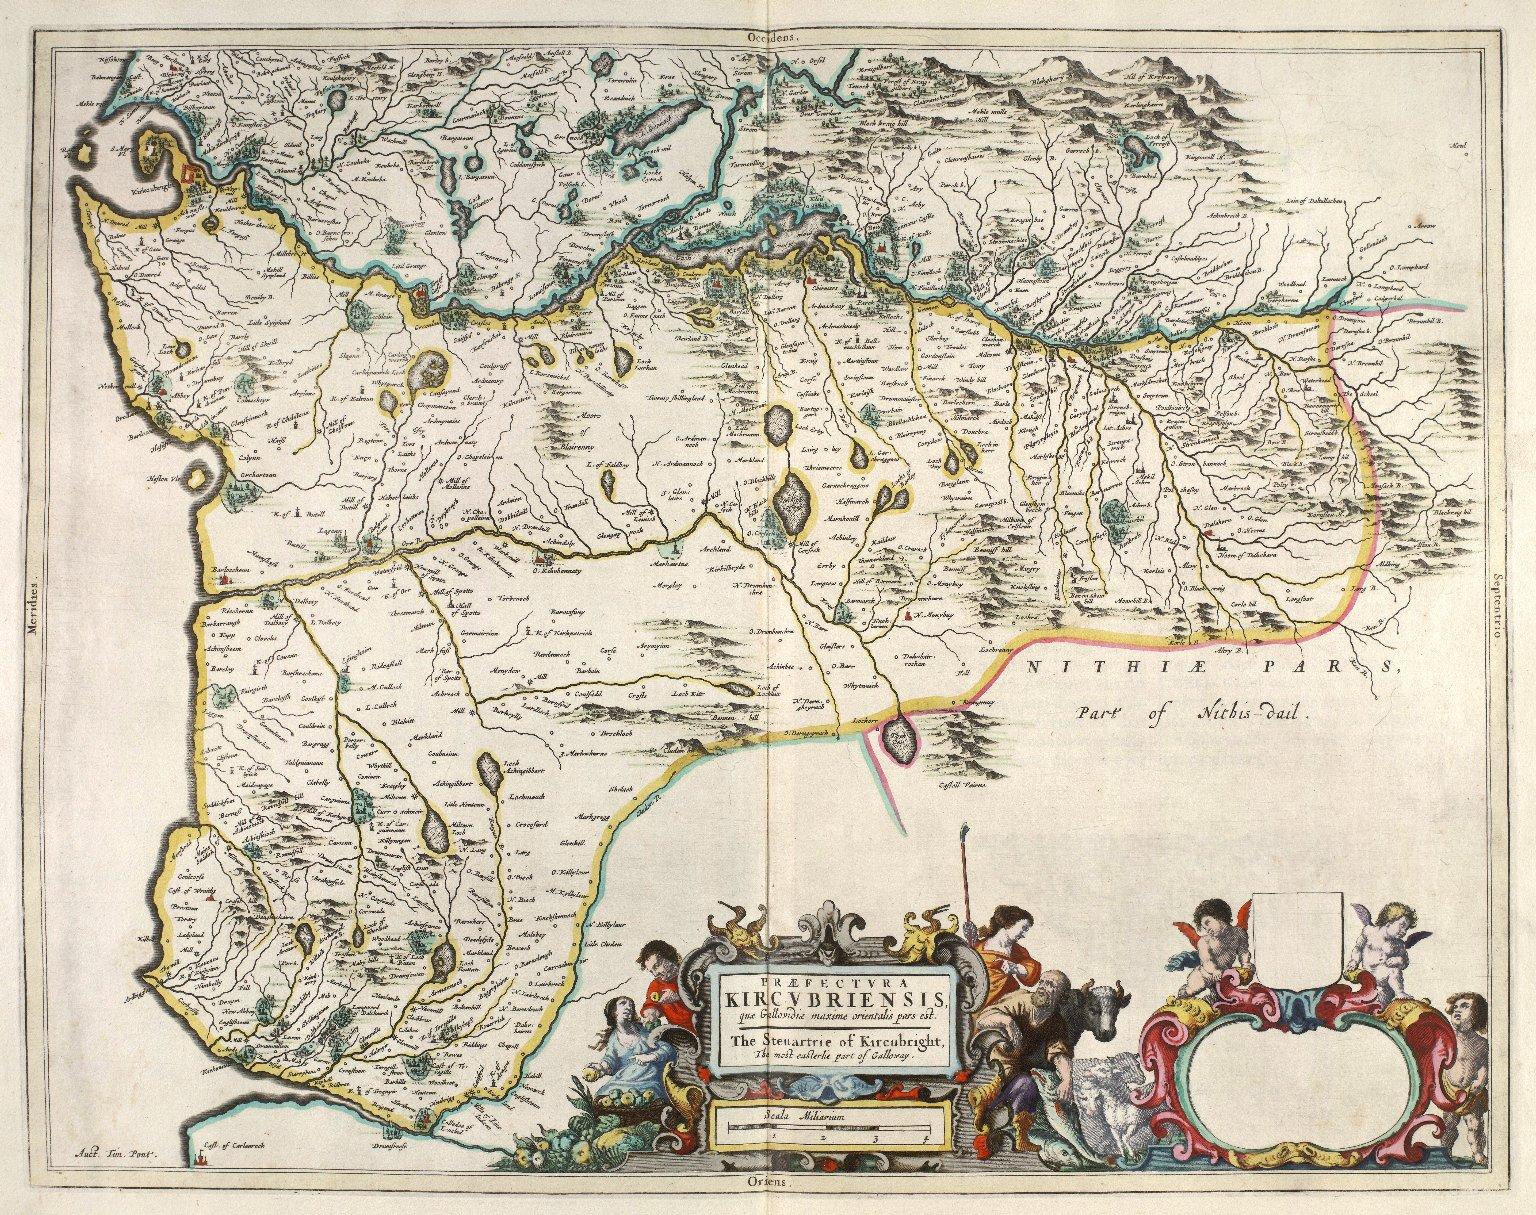 [Geographiae Blavianae] [Also known as: Atlas major] [057 of 153]